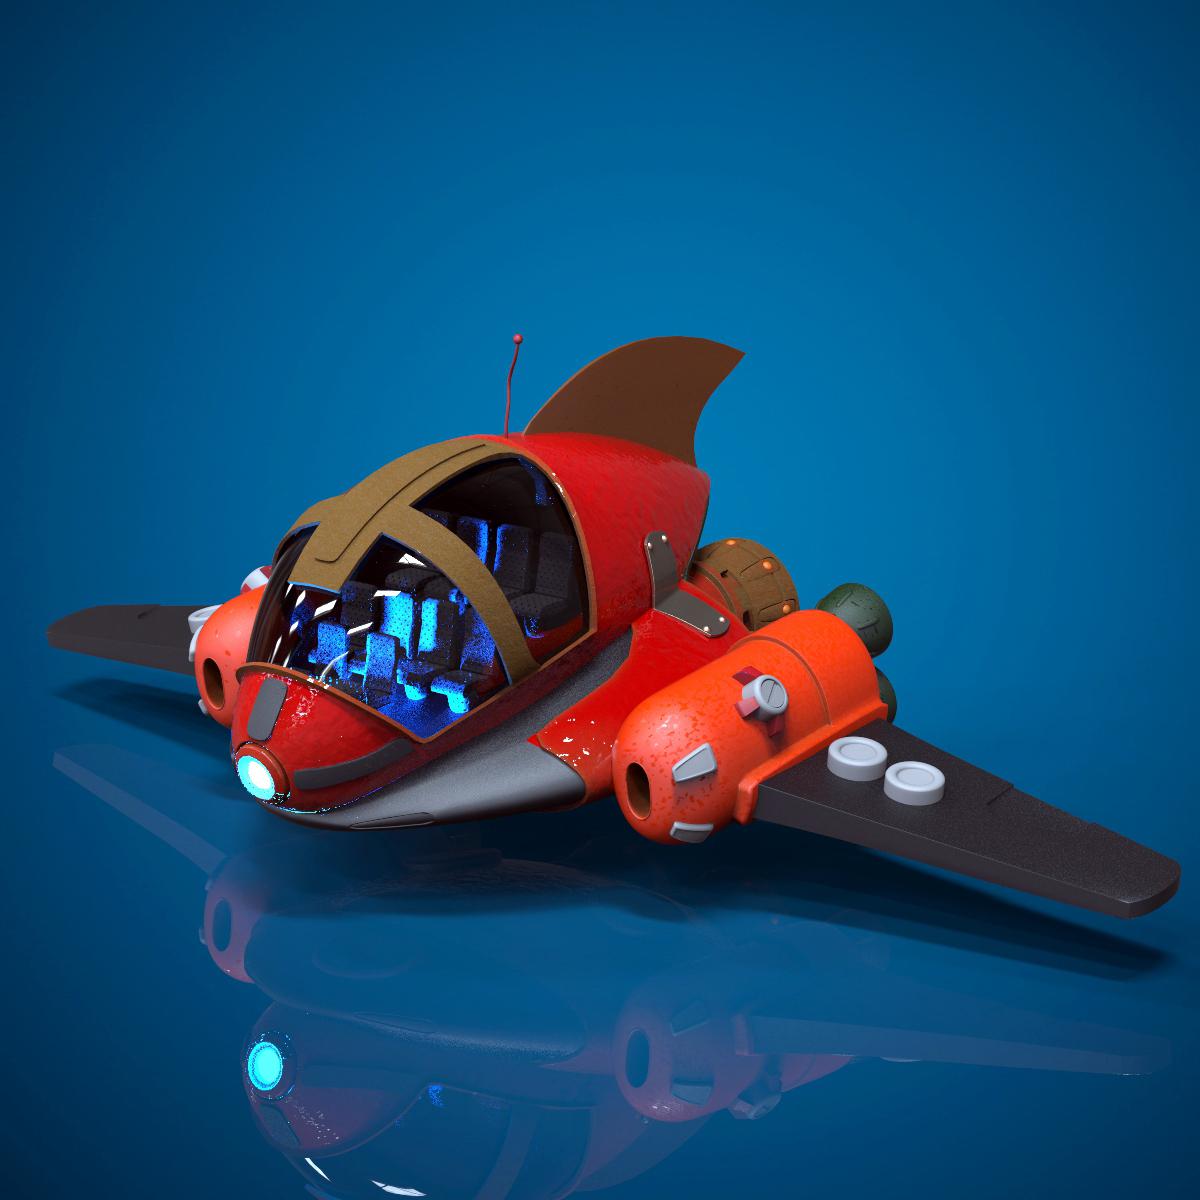 Cartoon Spaceship By Bonesinteractive 3docean